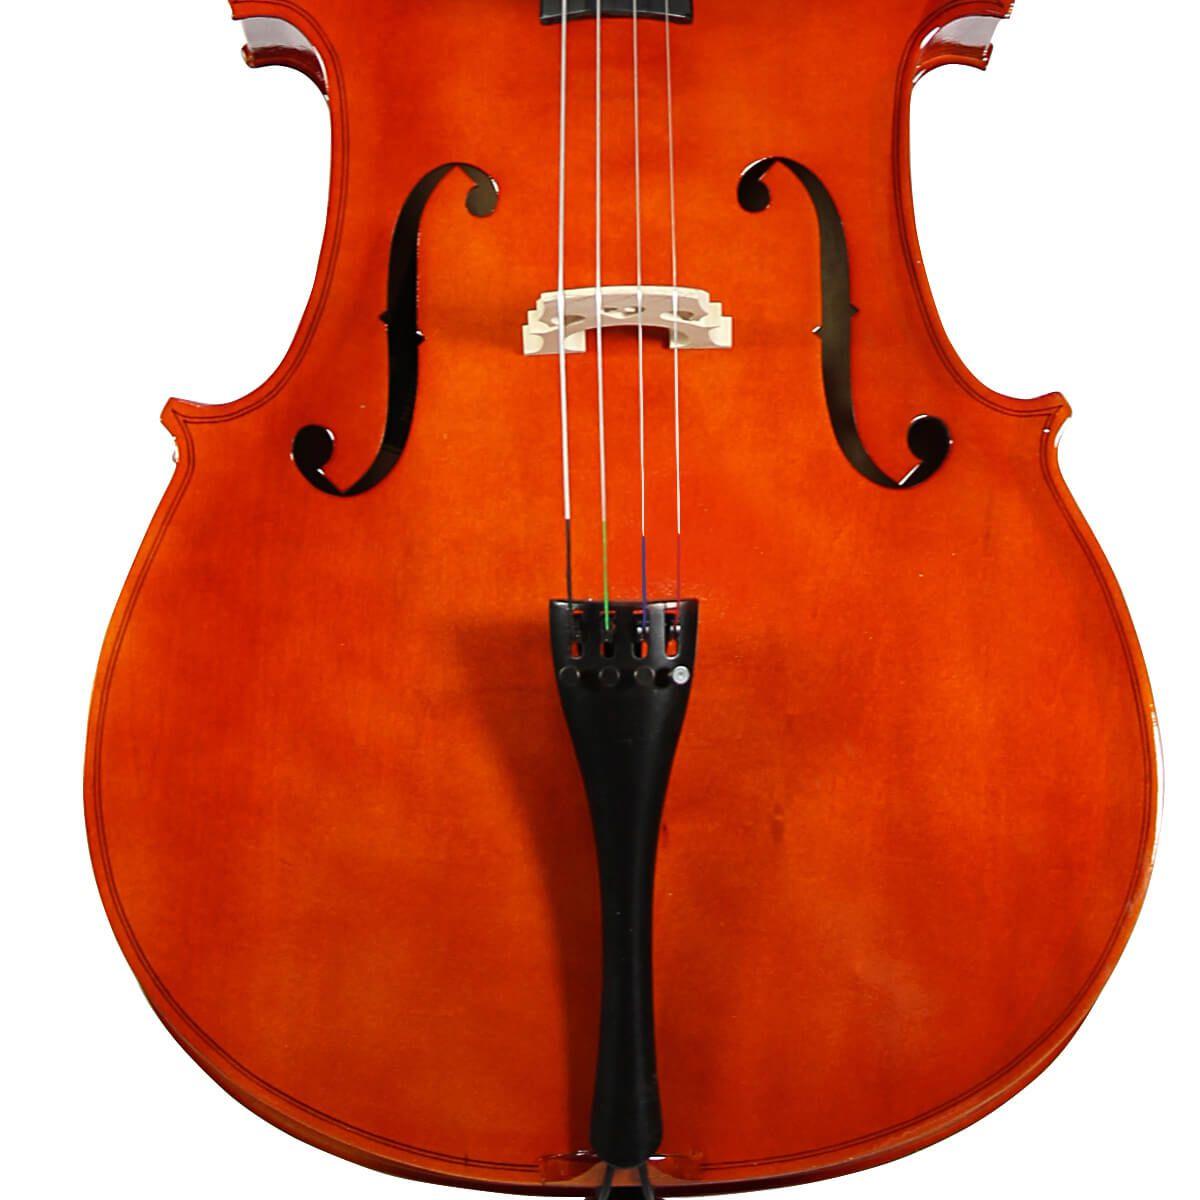 Cello Jahnke - Completo Com Capa E Arco